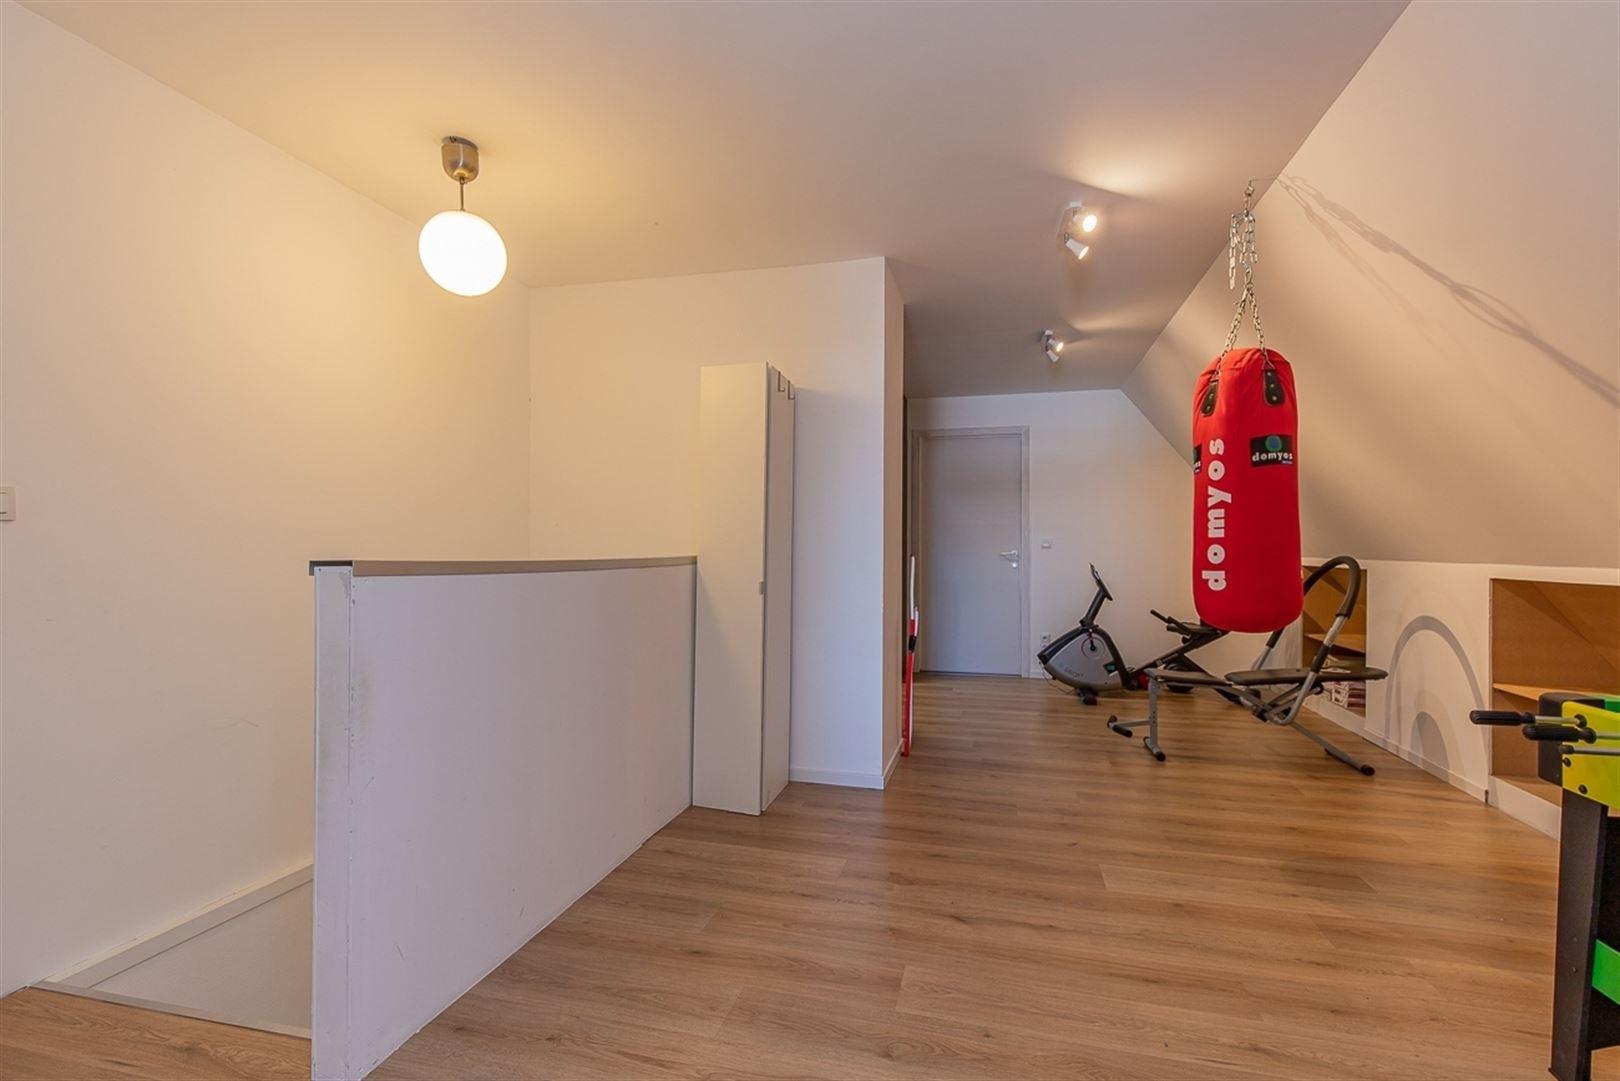 Foto 13 : Villa te 9100 SINT-NIKLAAS (België) - Prijs € 549.000